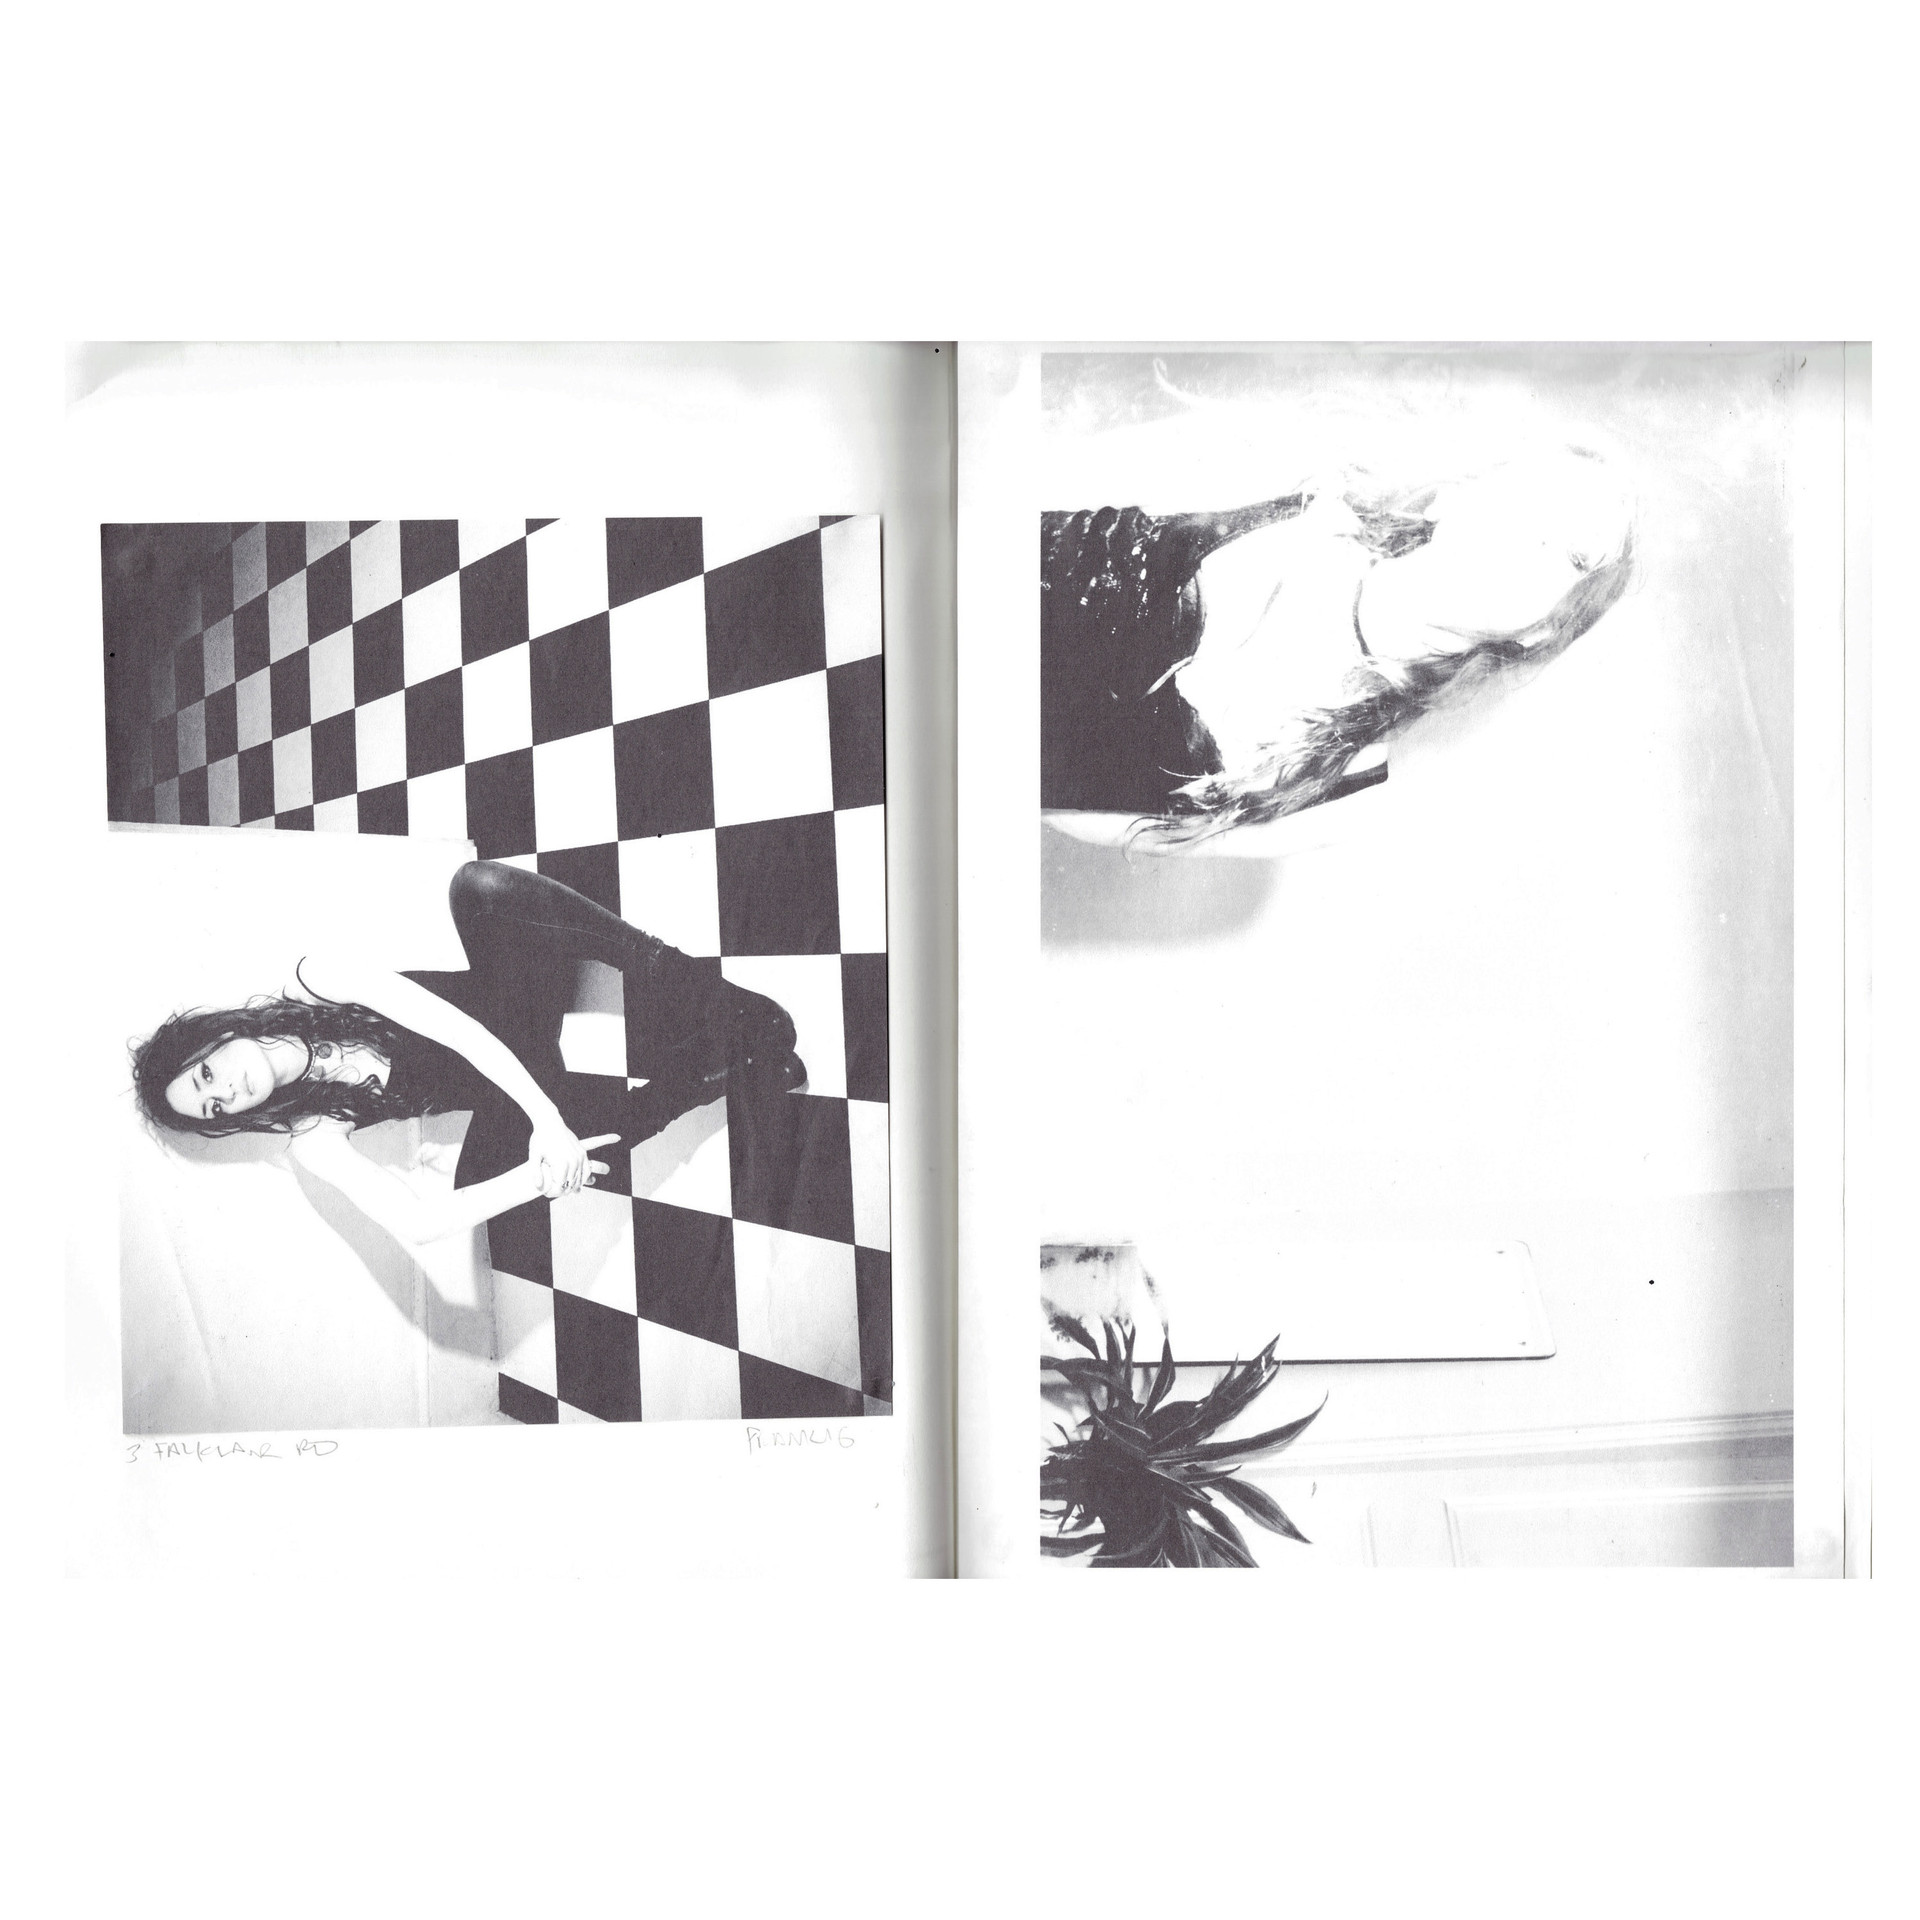 Untitled-4 copy 2.jpg